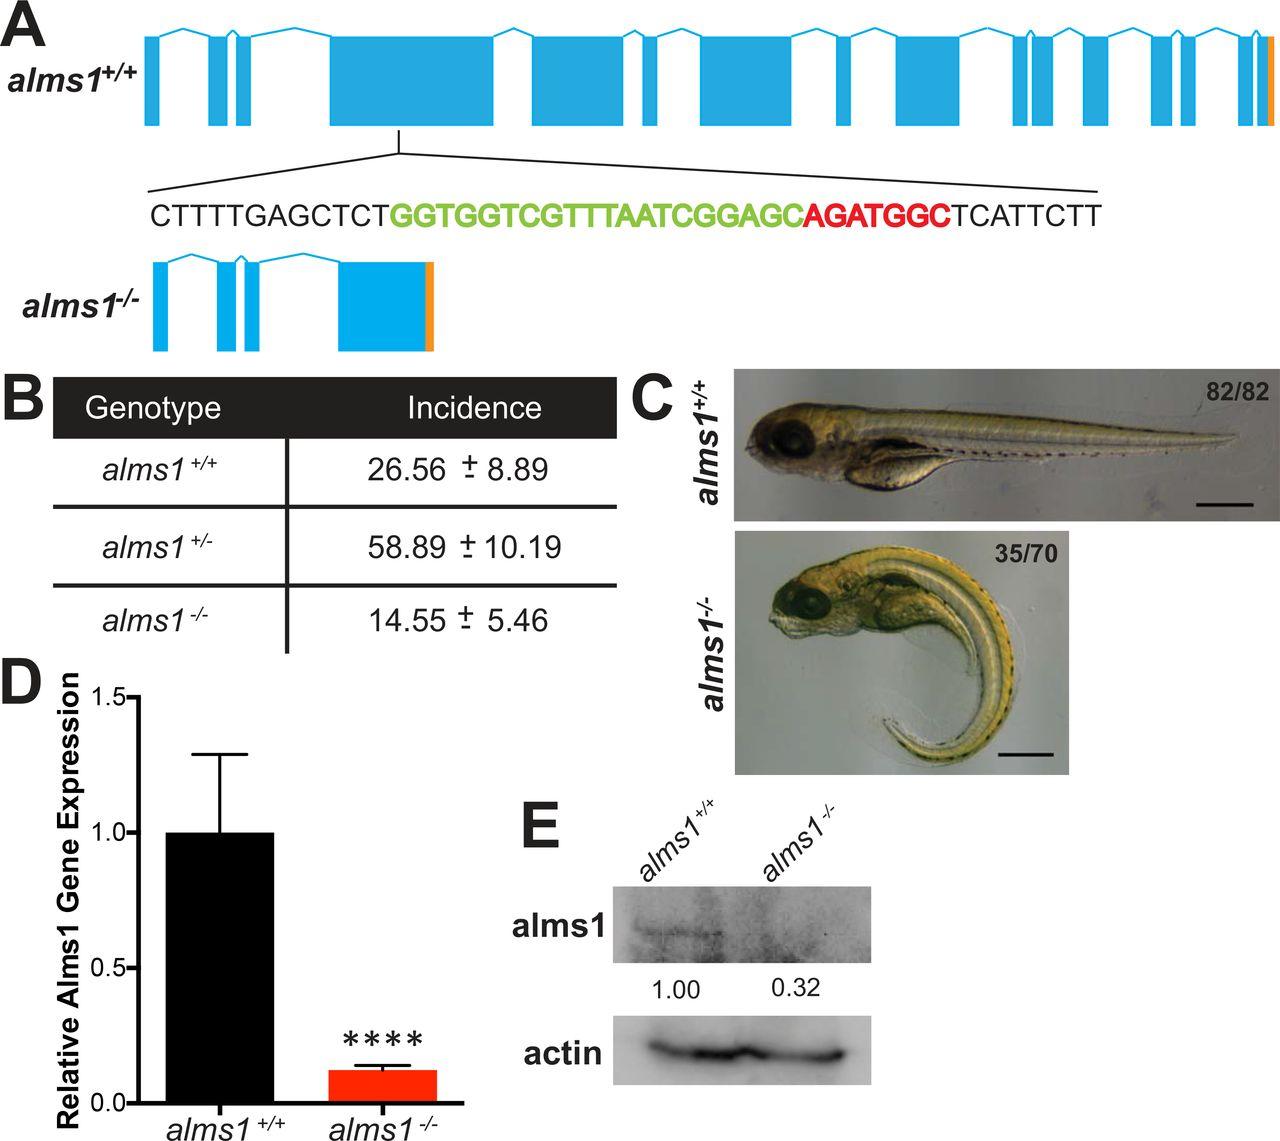 Genomic knockout of alms1 in zebrafish recapitulates Alström